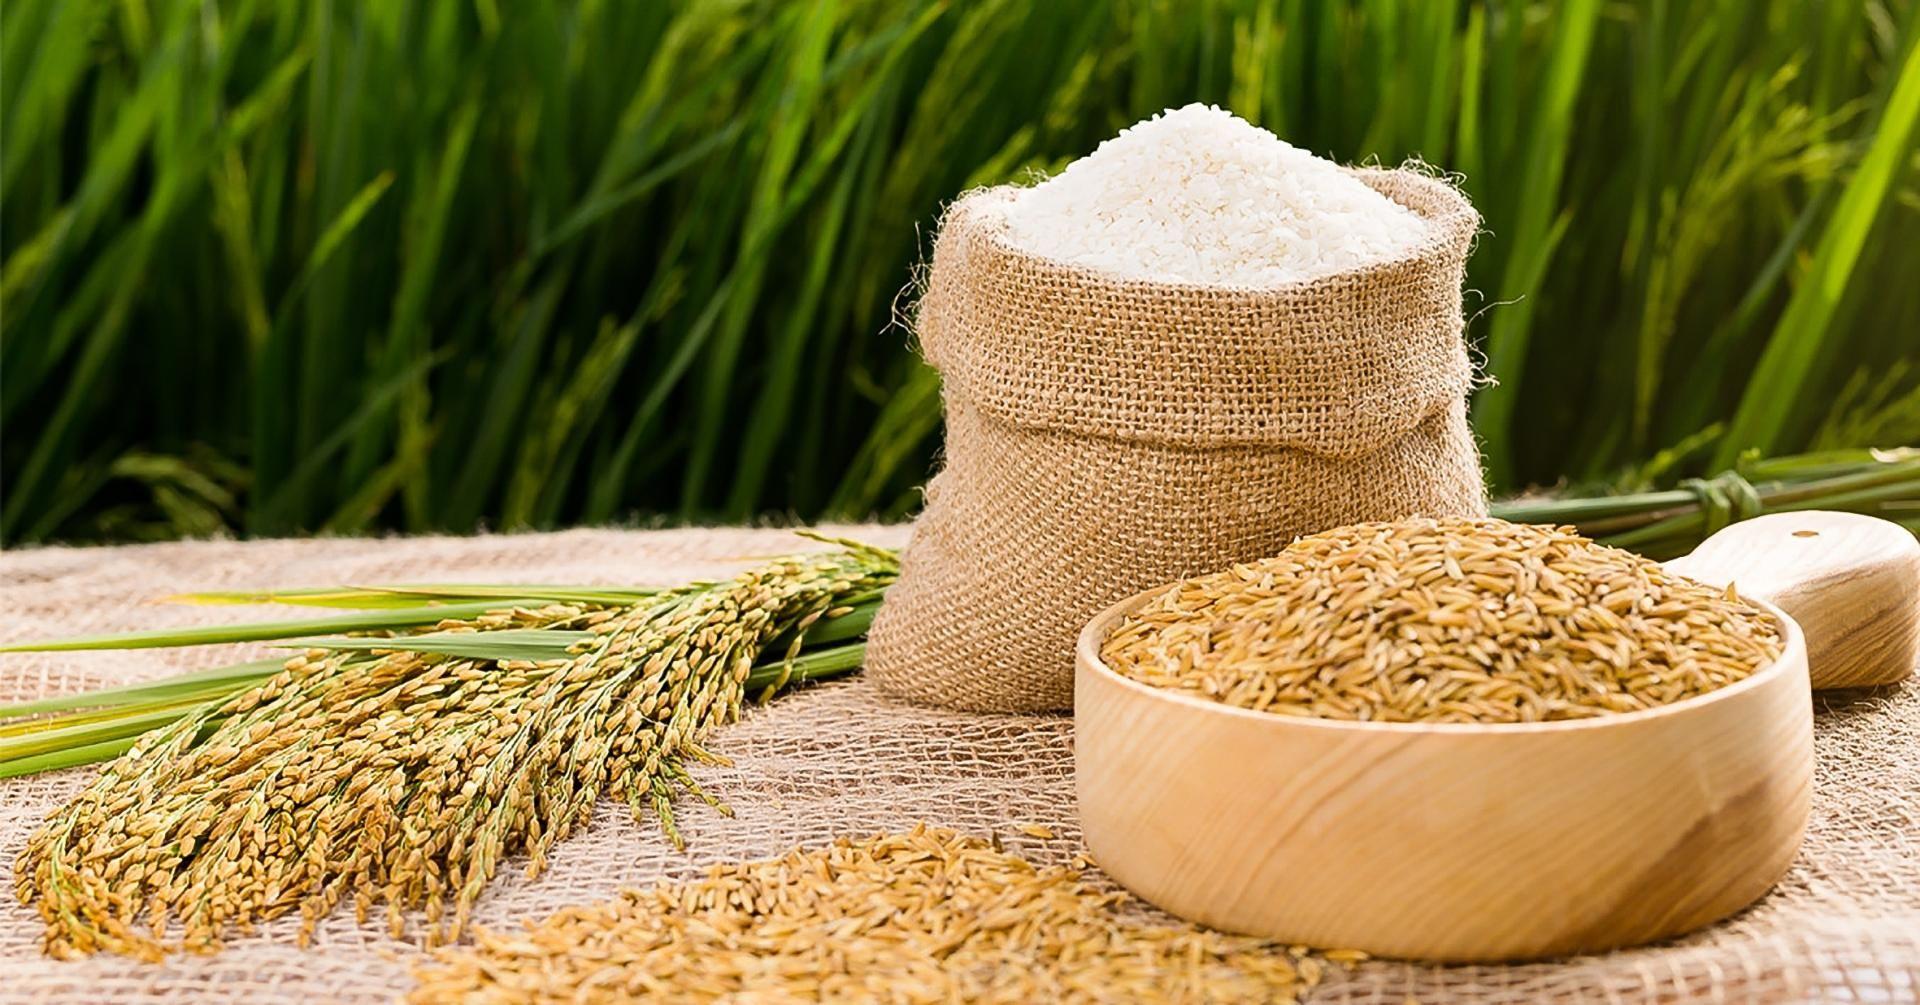 giá lúa gạo